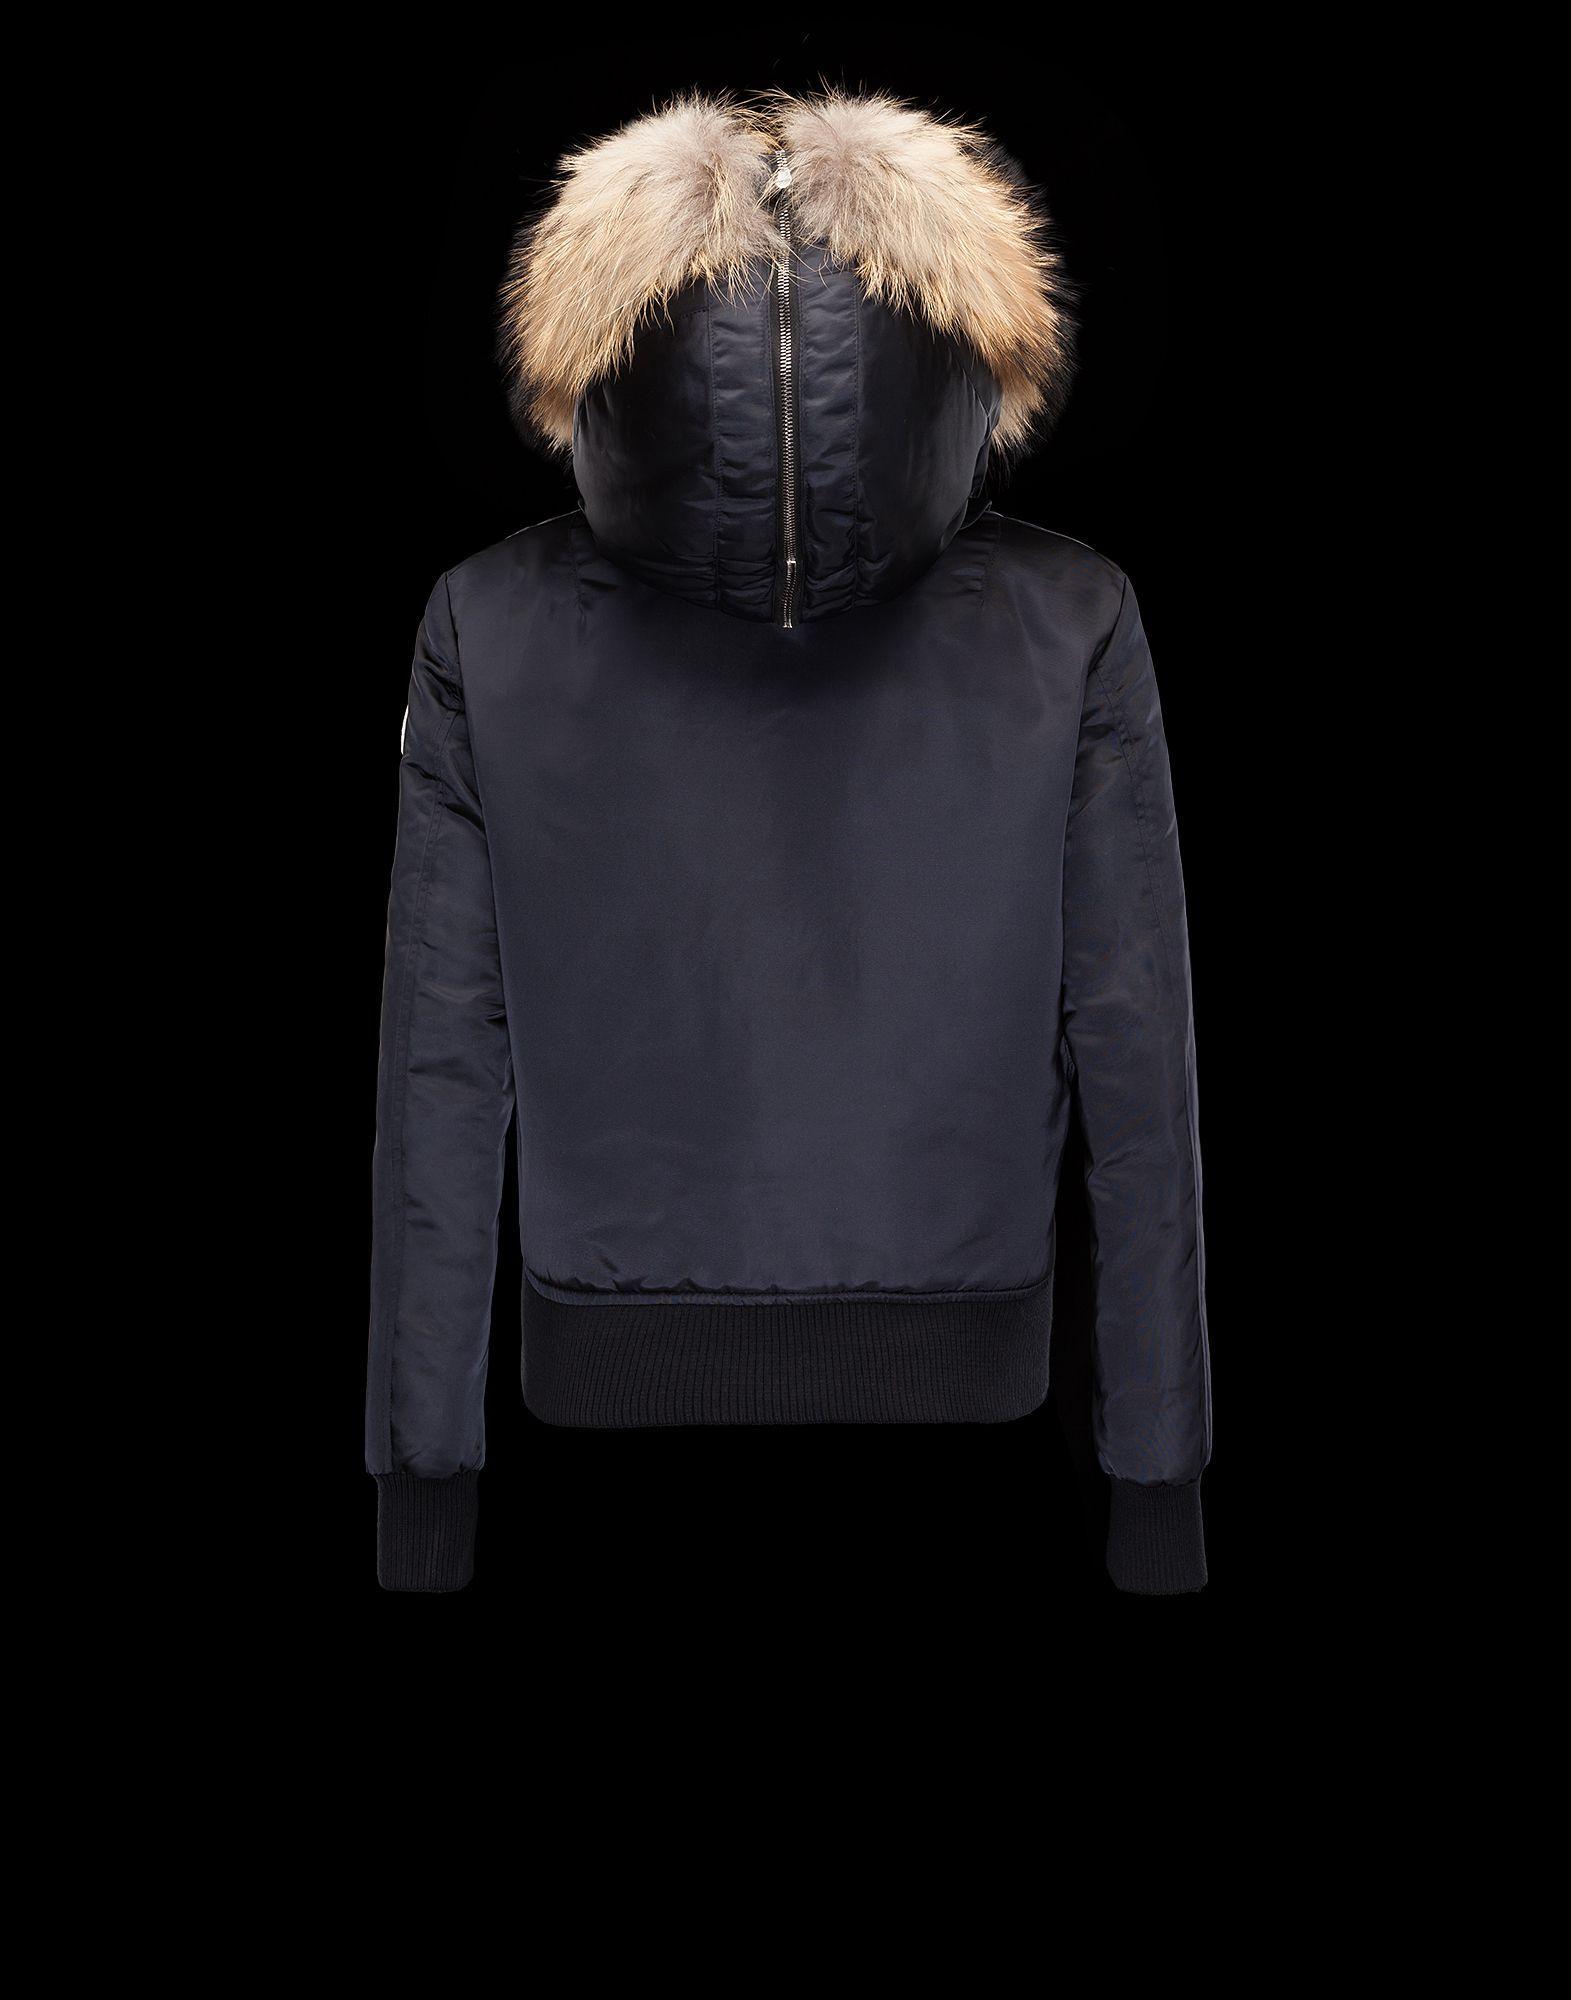 218b7b16da14 Moncler Bomber Jacket EULIMENE Women Fall Winter 2015 16